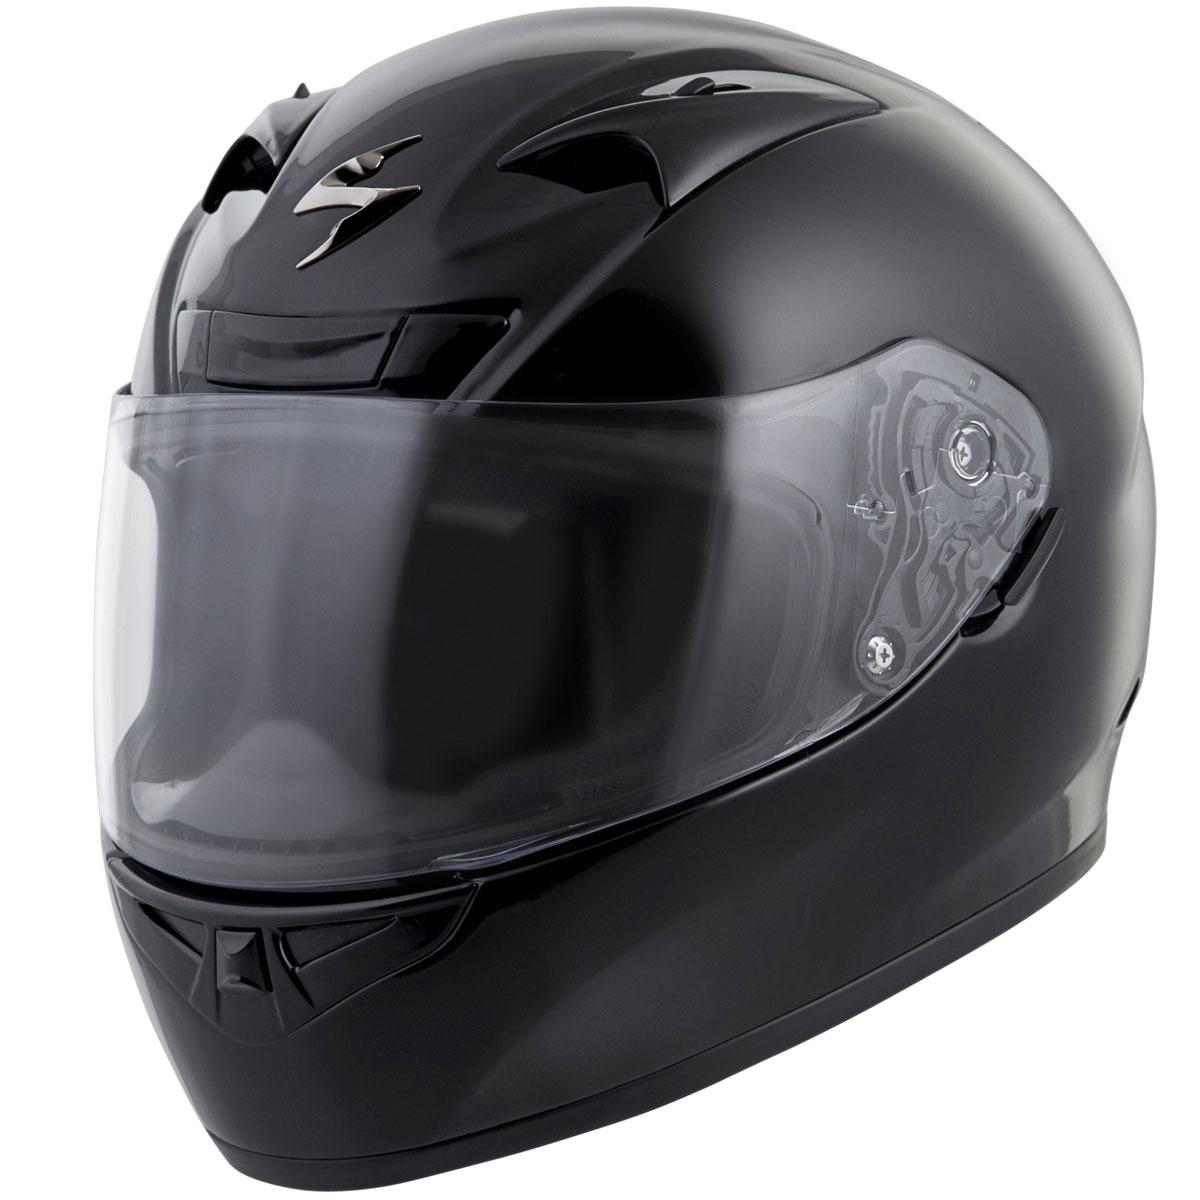 scorpion exo helmet helmetcentral renegade tucson 520. Black Bedroom Furniture Sets. Home Design Ideas